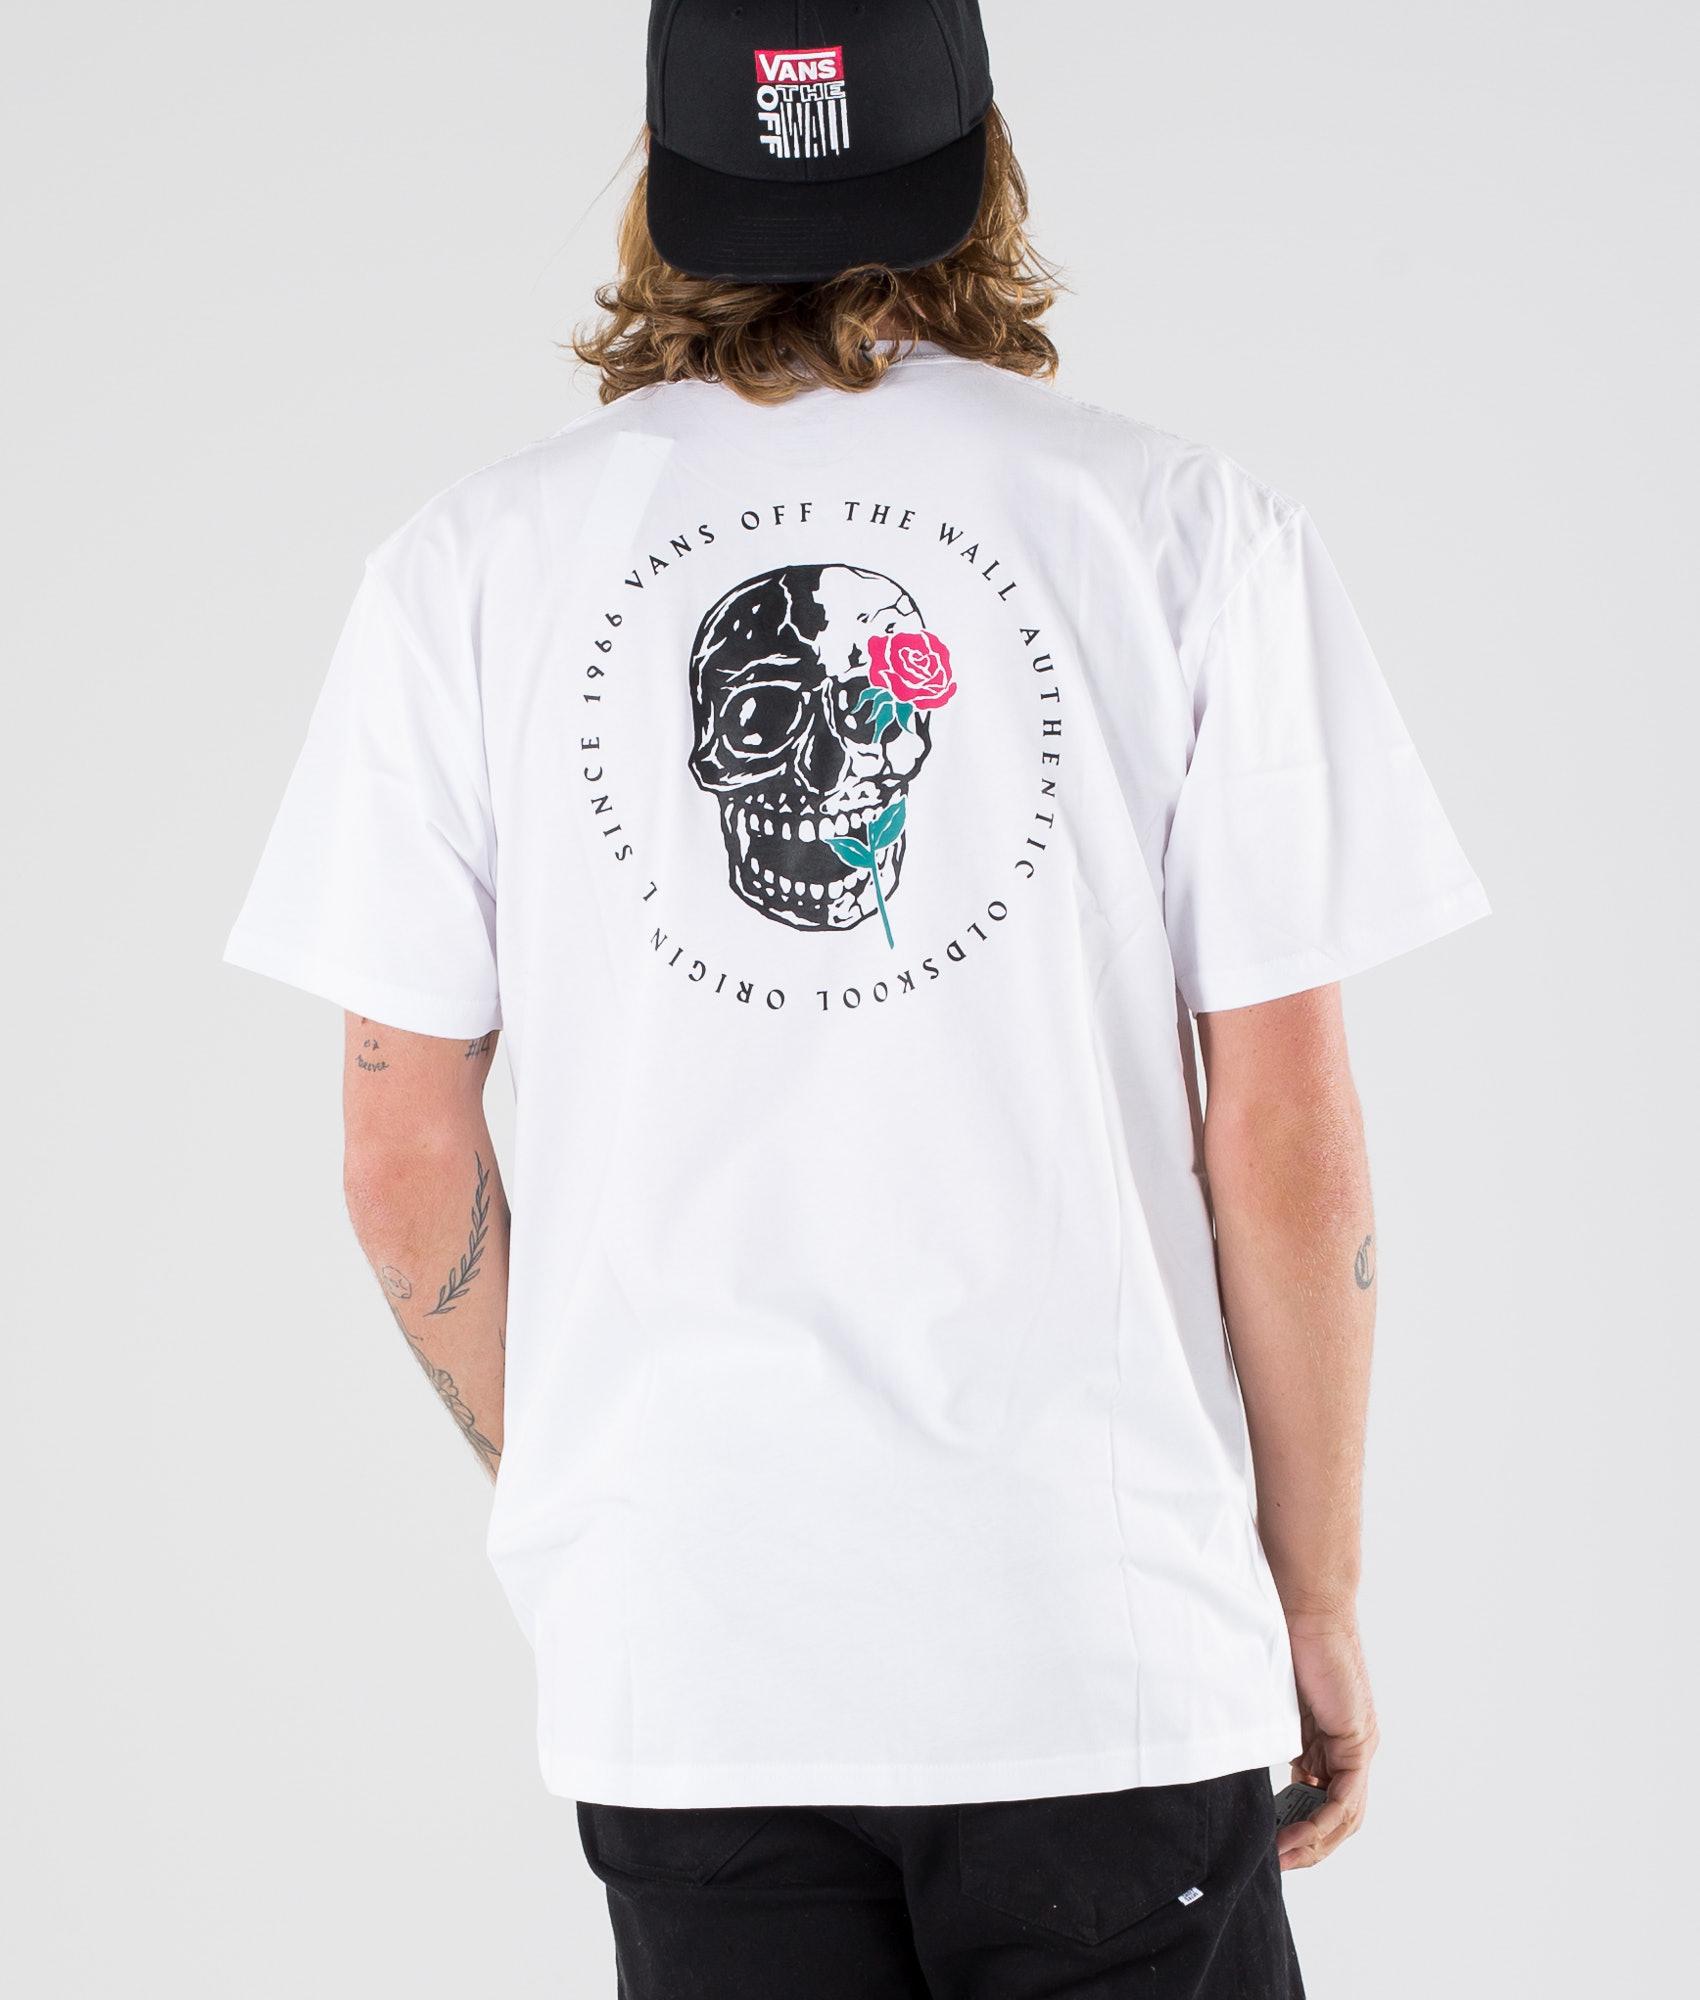 536fe133d8 Vans Coming Up Roses Ss T-shirt White - Ridestore.com